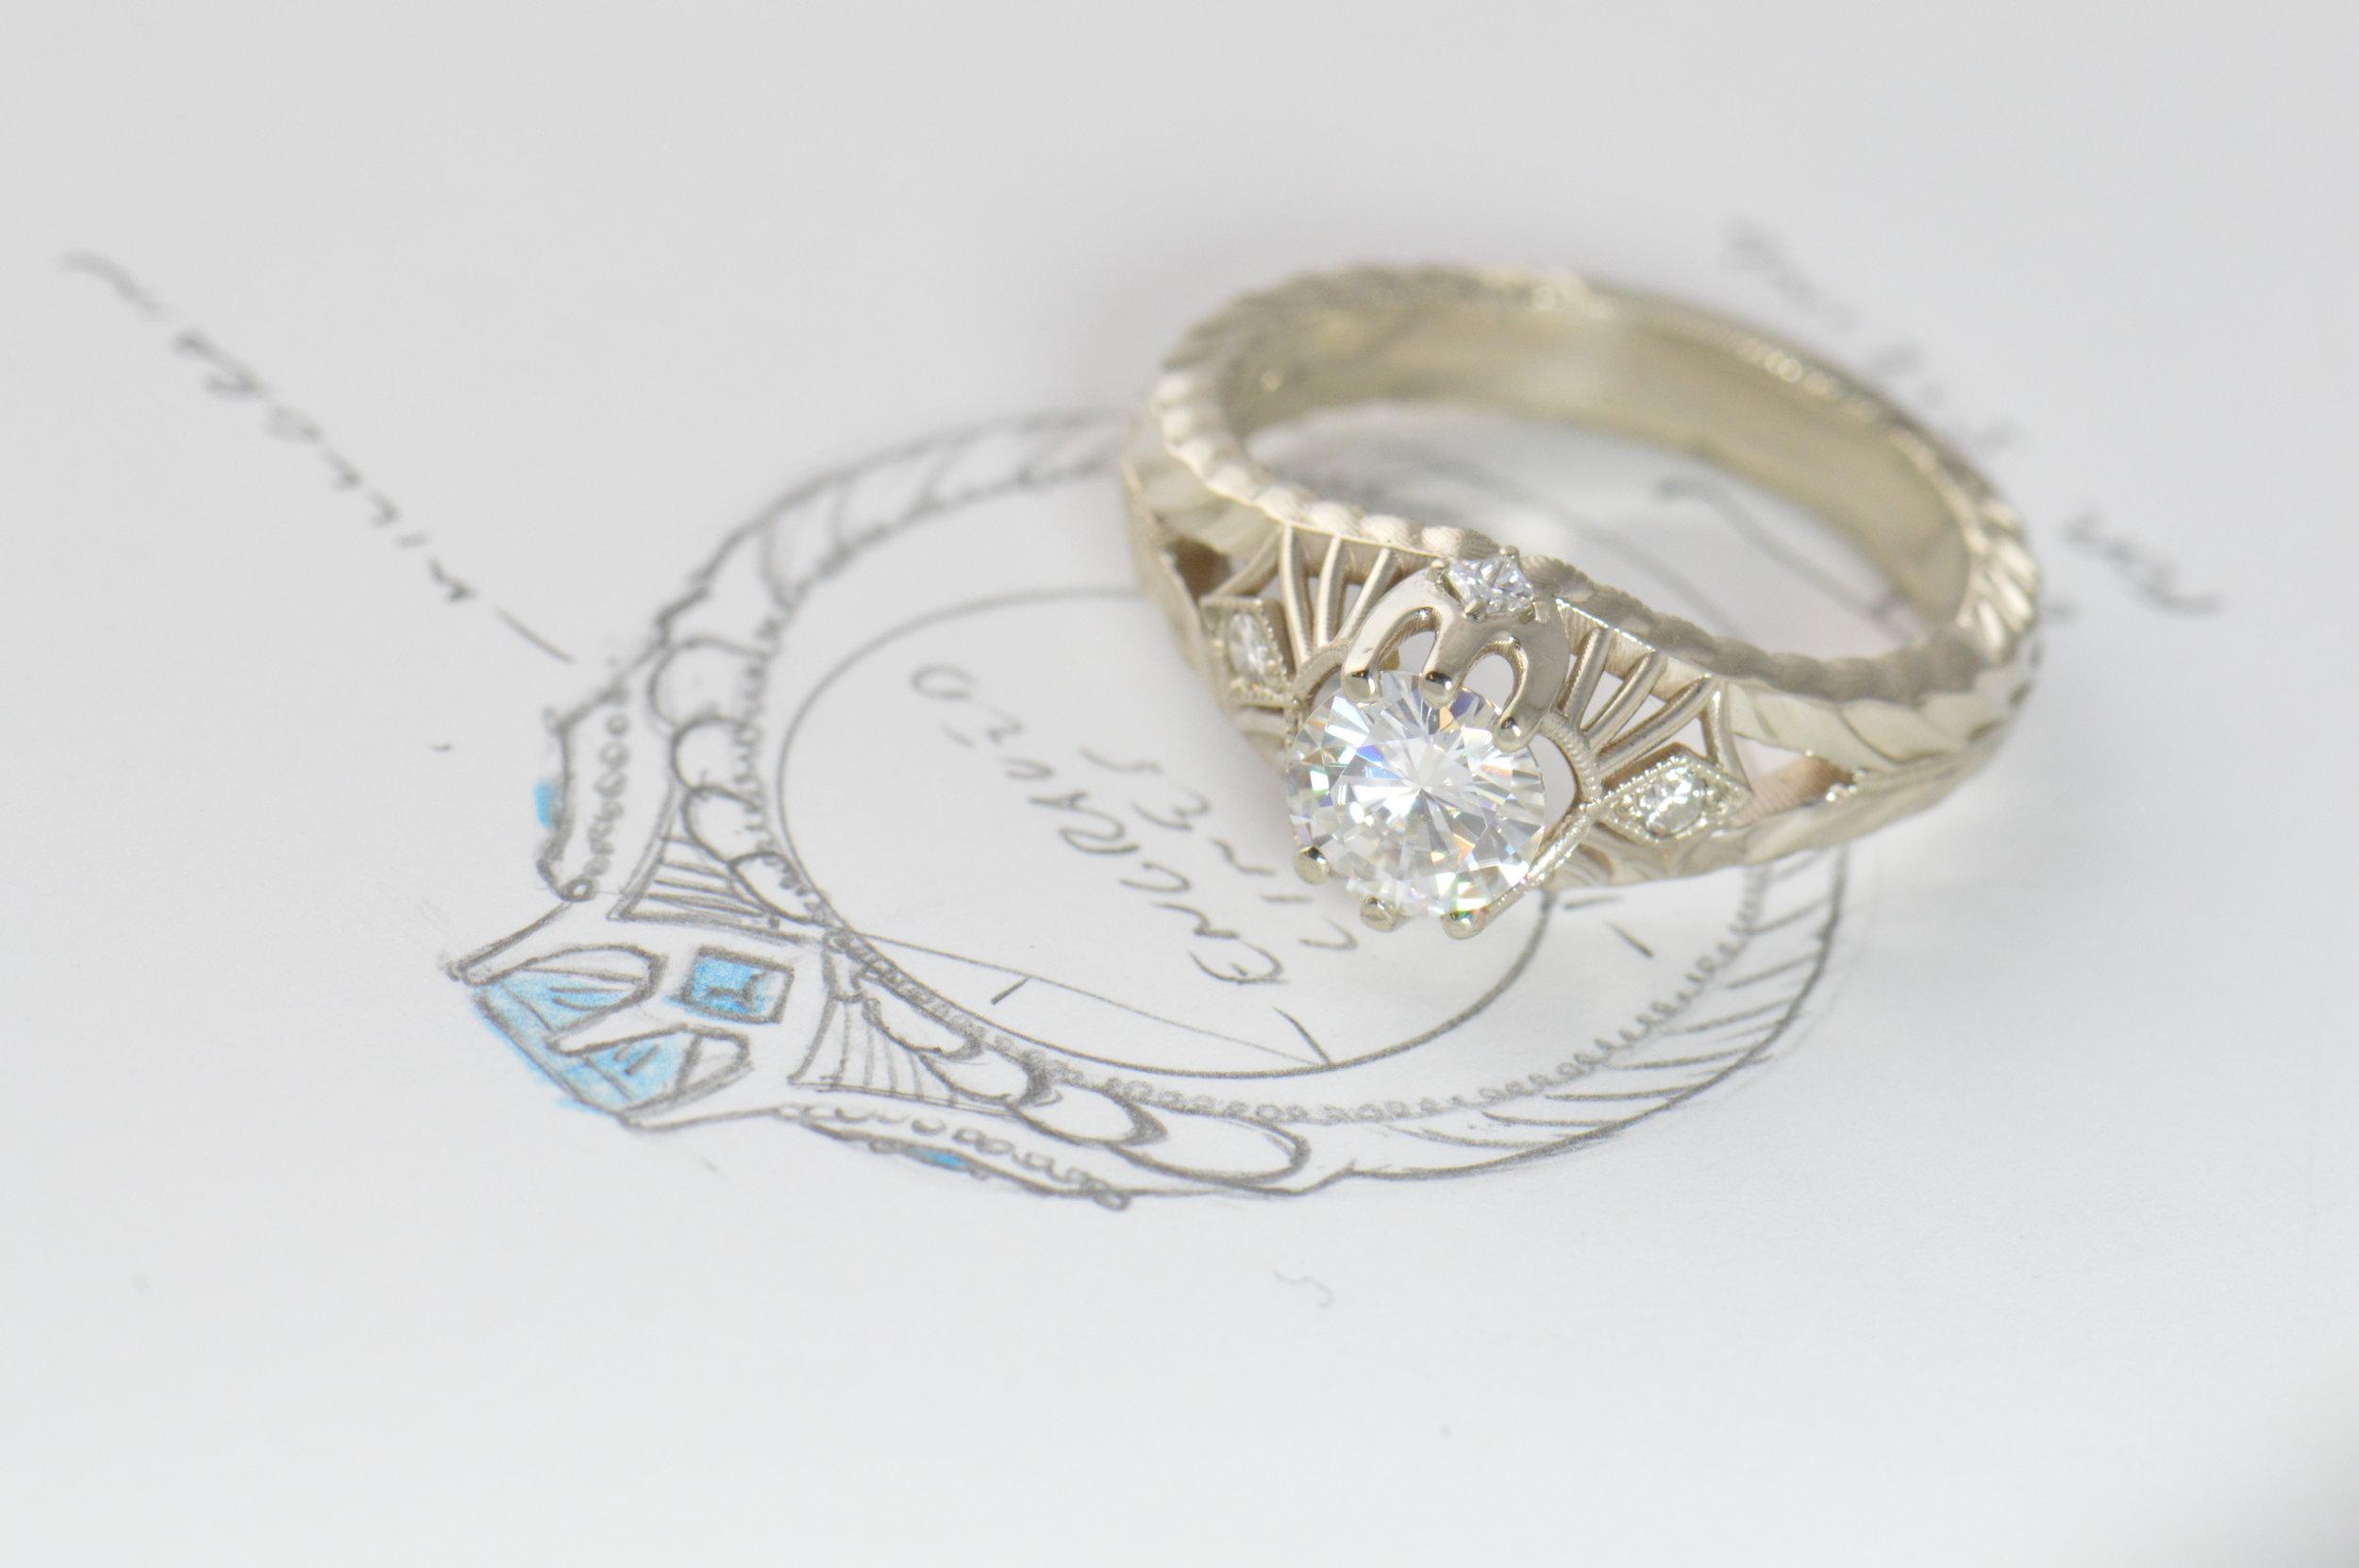 darvier-custom-trident-vintage-inspired-ring.JPG